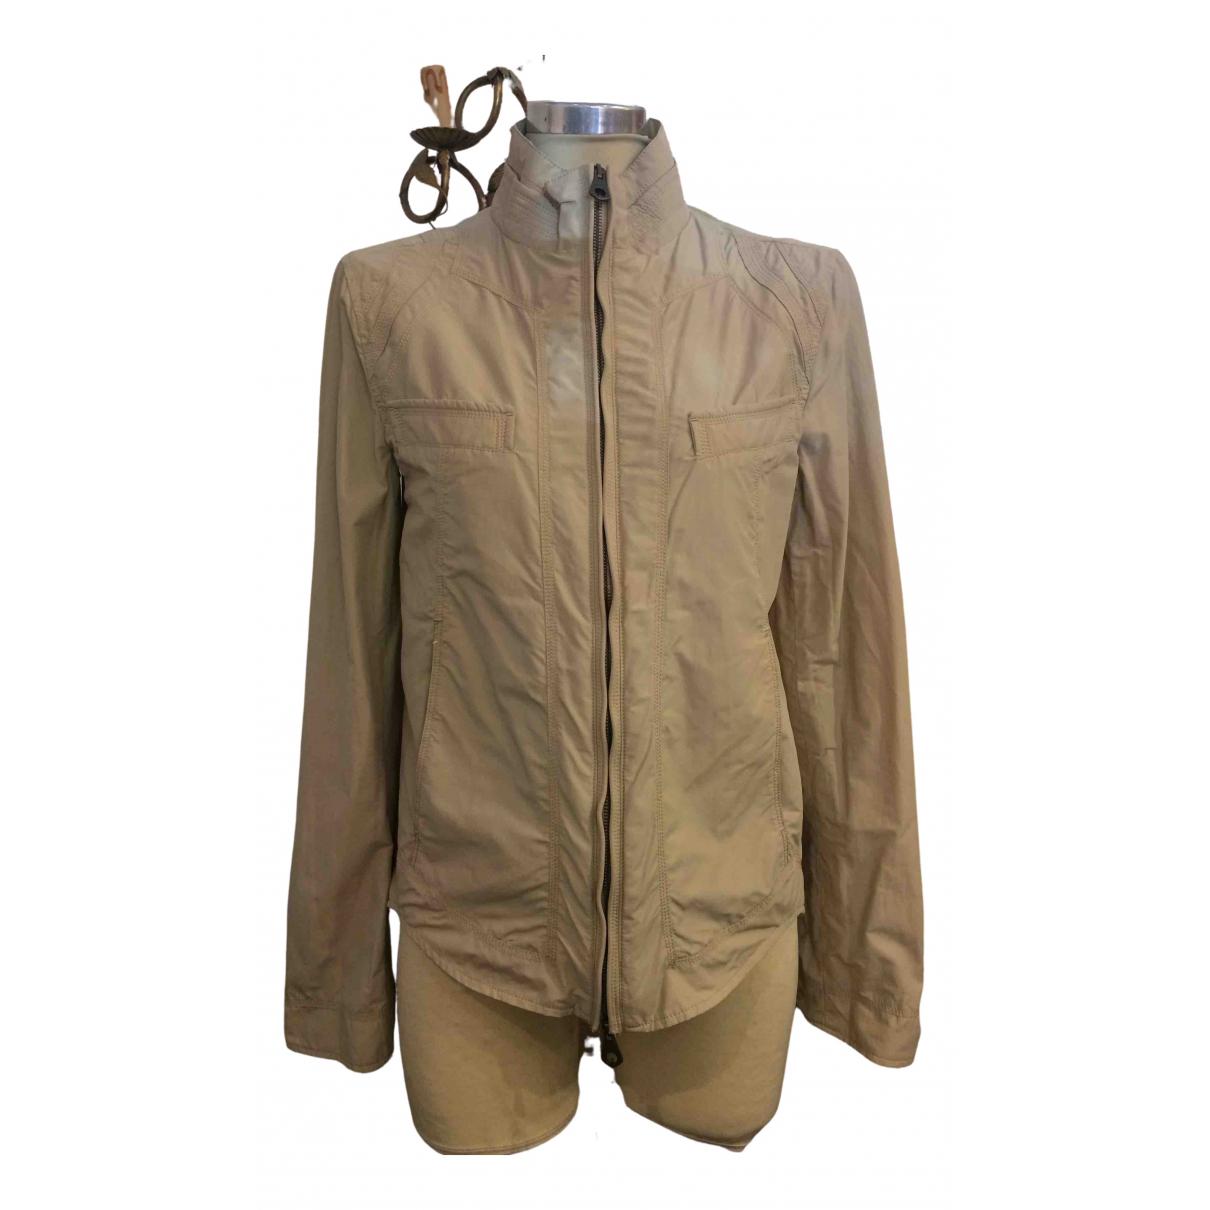 Ermanno Scervino \N Beige jacket for Women 46 IT